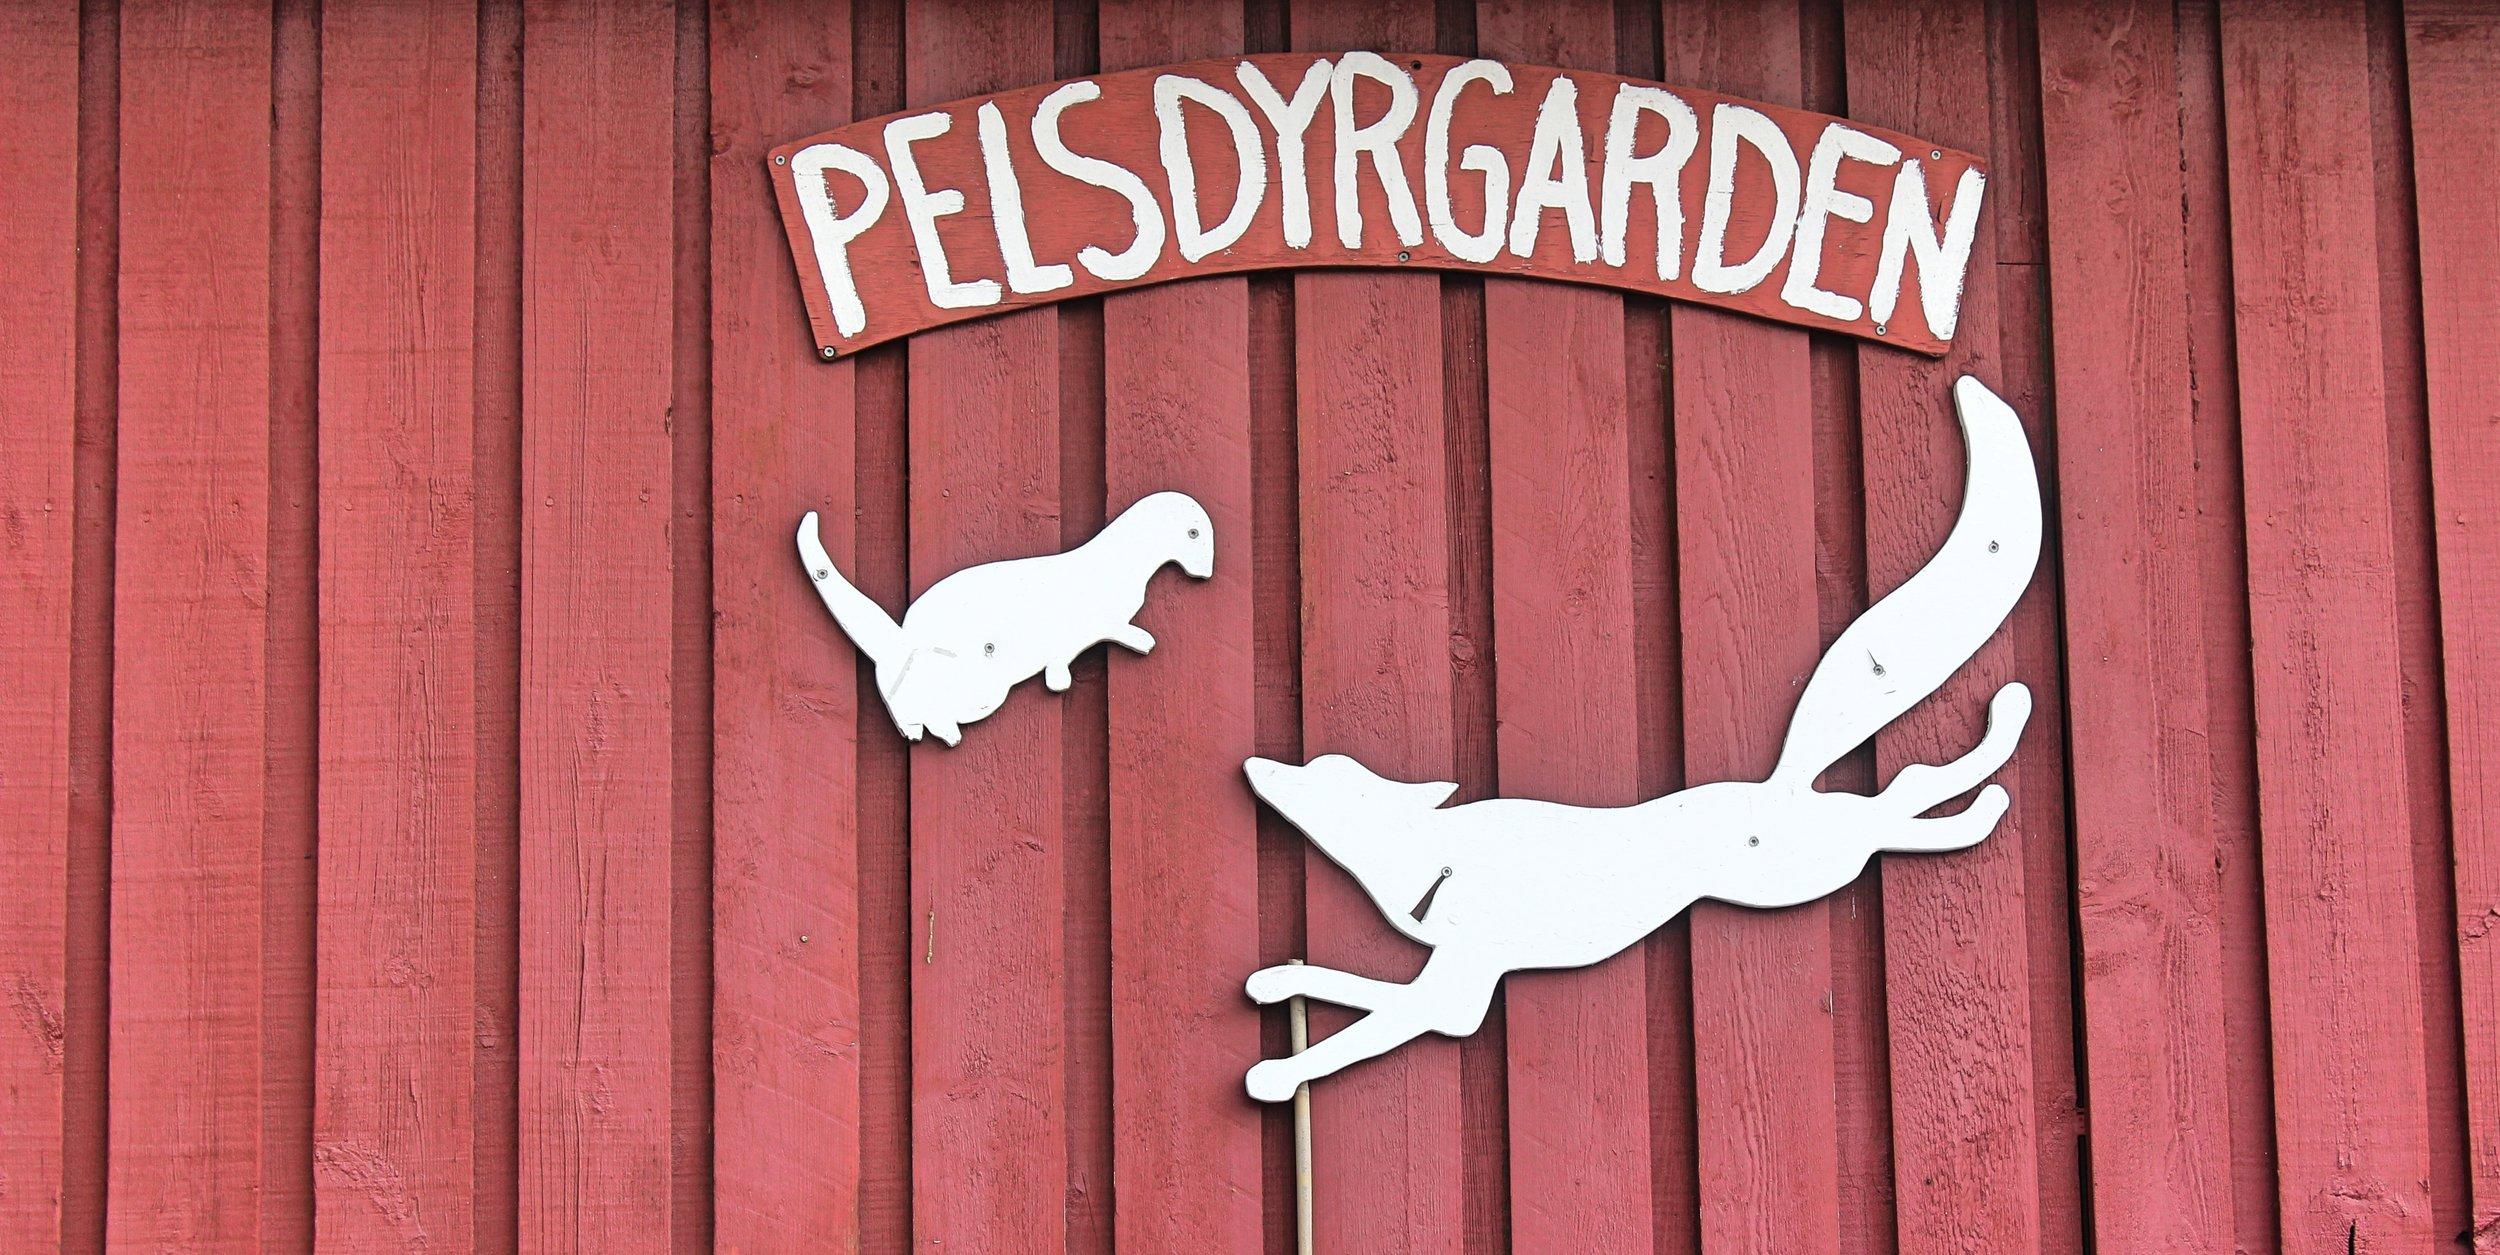 Pelsdyrgarden - Merete Guldhav.jpg